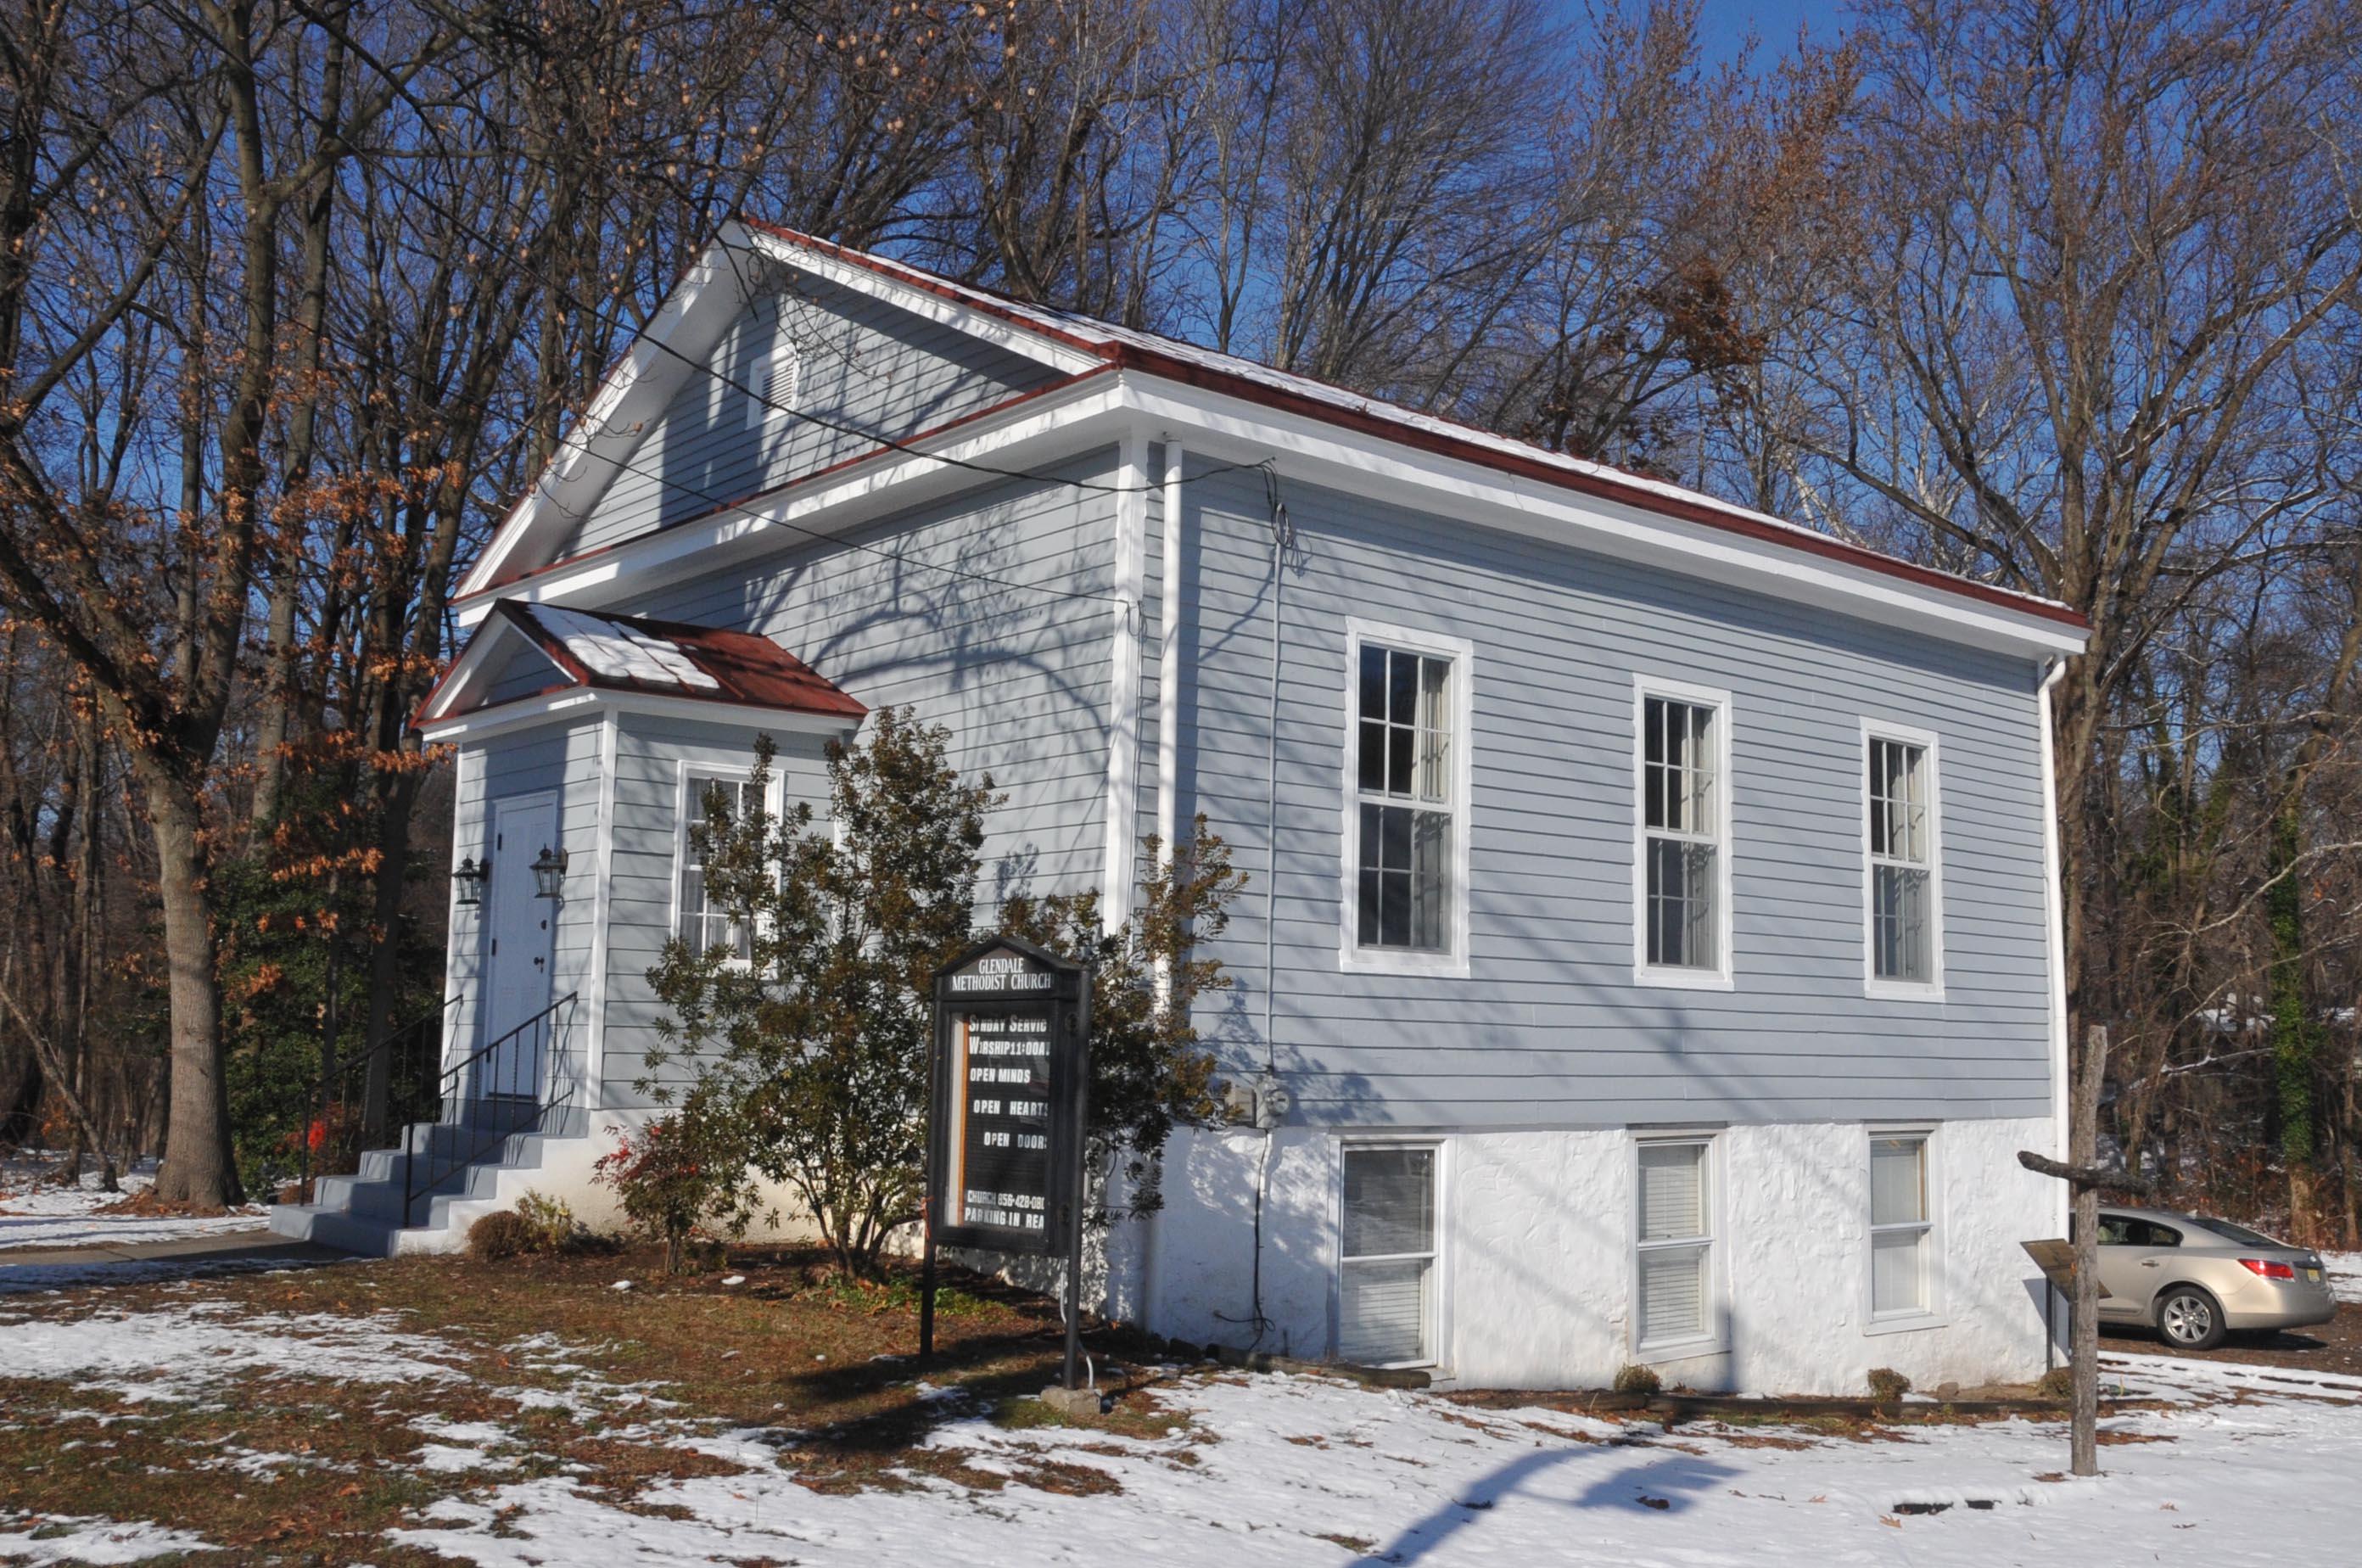 Basement Waterproofing and Foundation Repair in Mt. Laurel